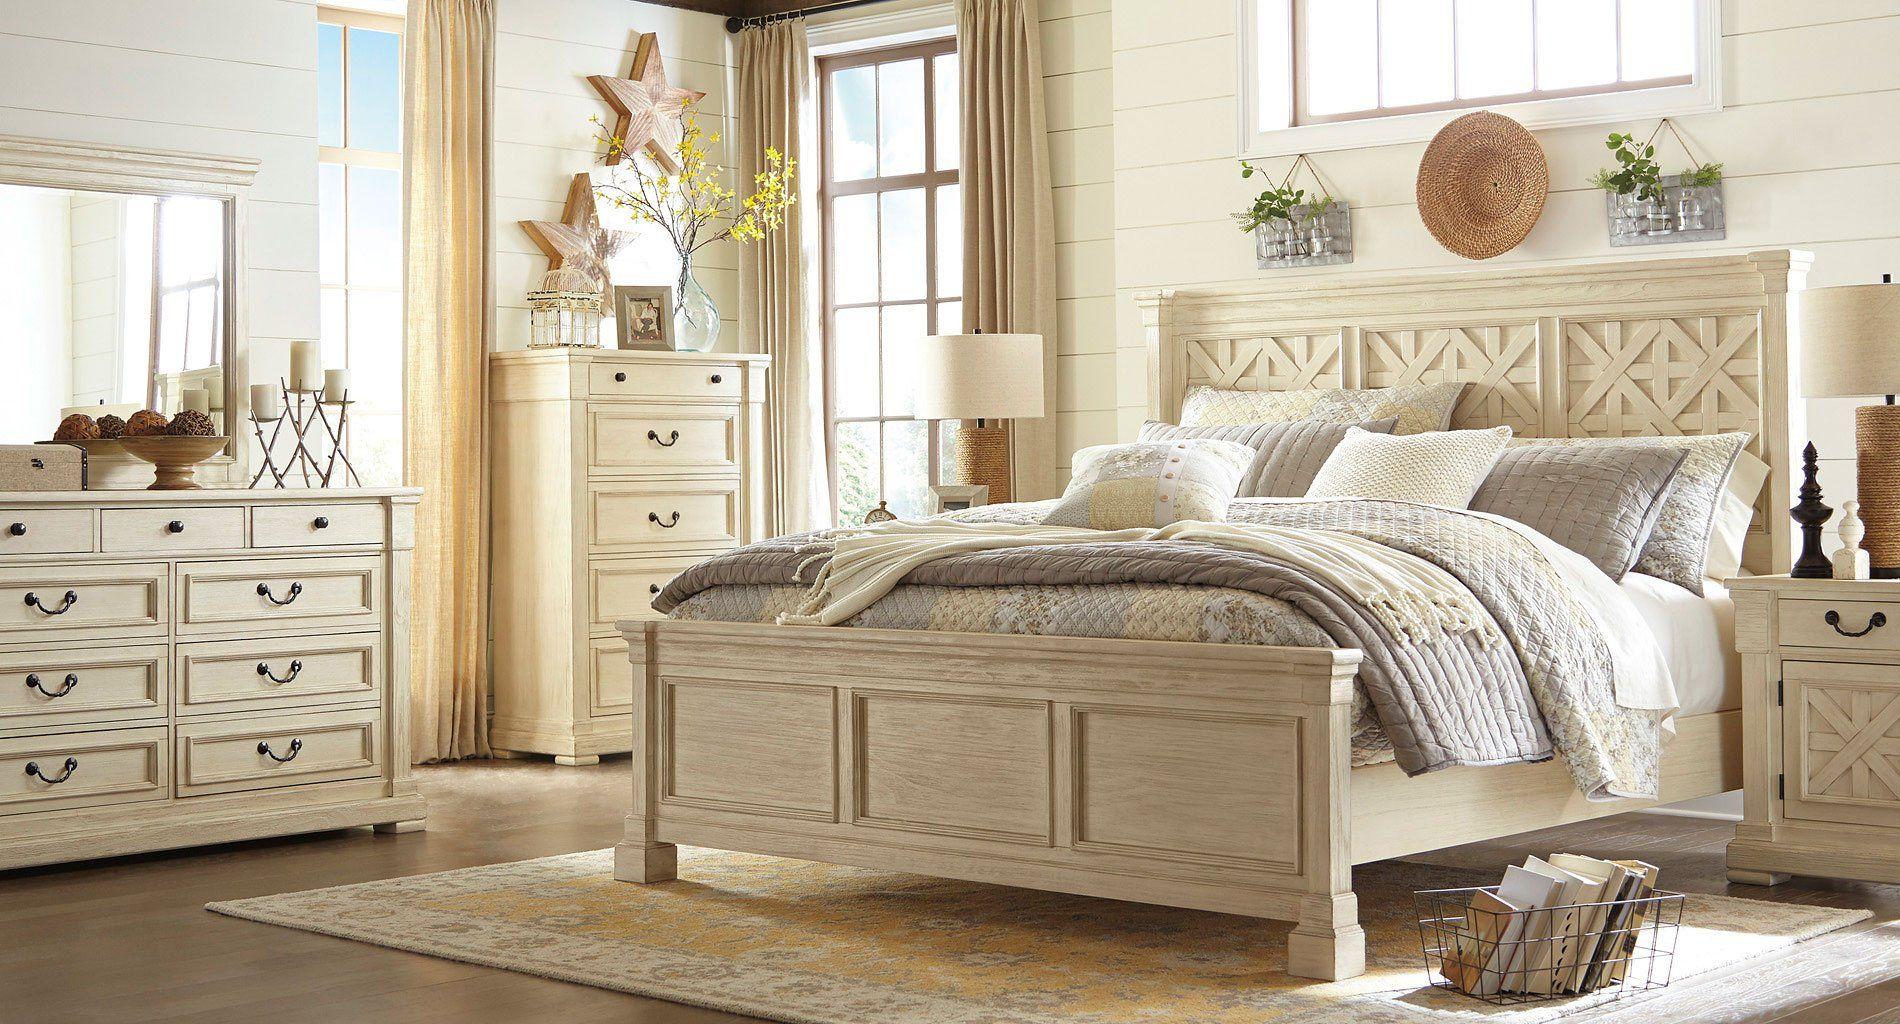 Best Bolanburg Panel Bedroom Set Bedroom Furniture Sets White Paneling White Panel Beds 400 x 300